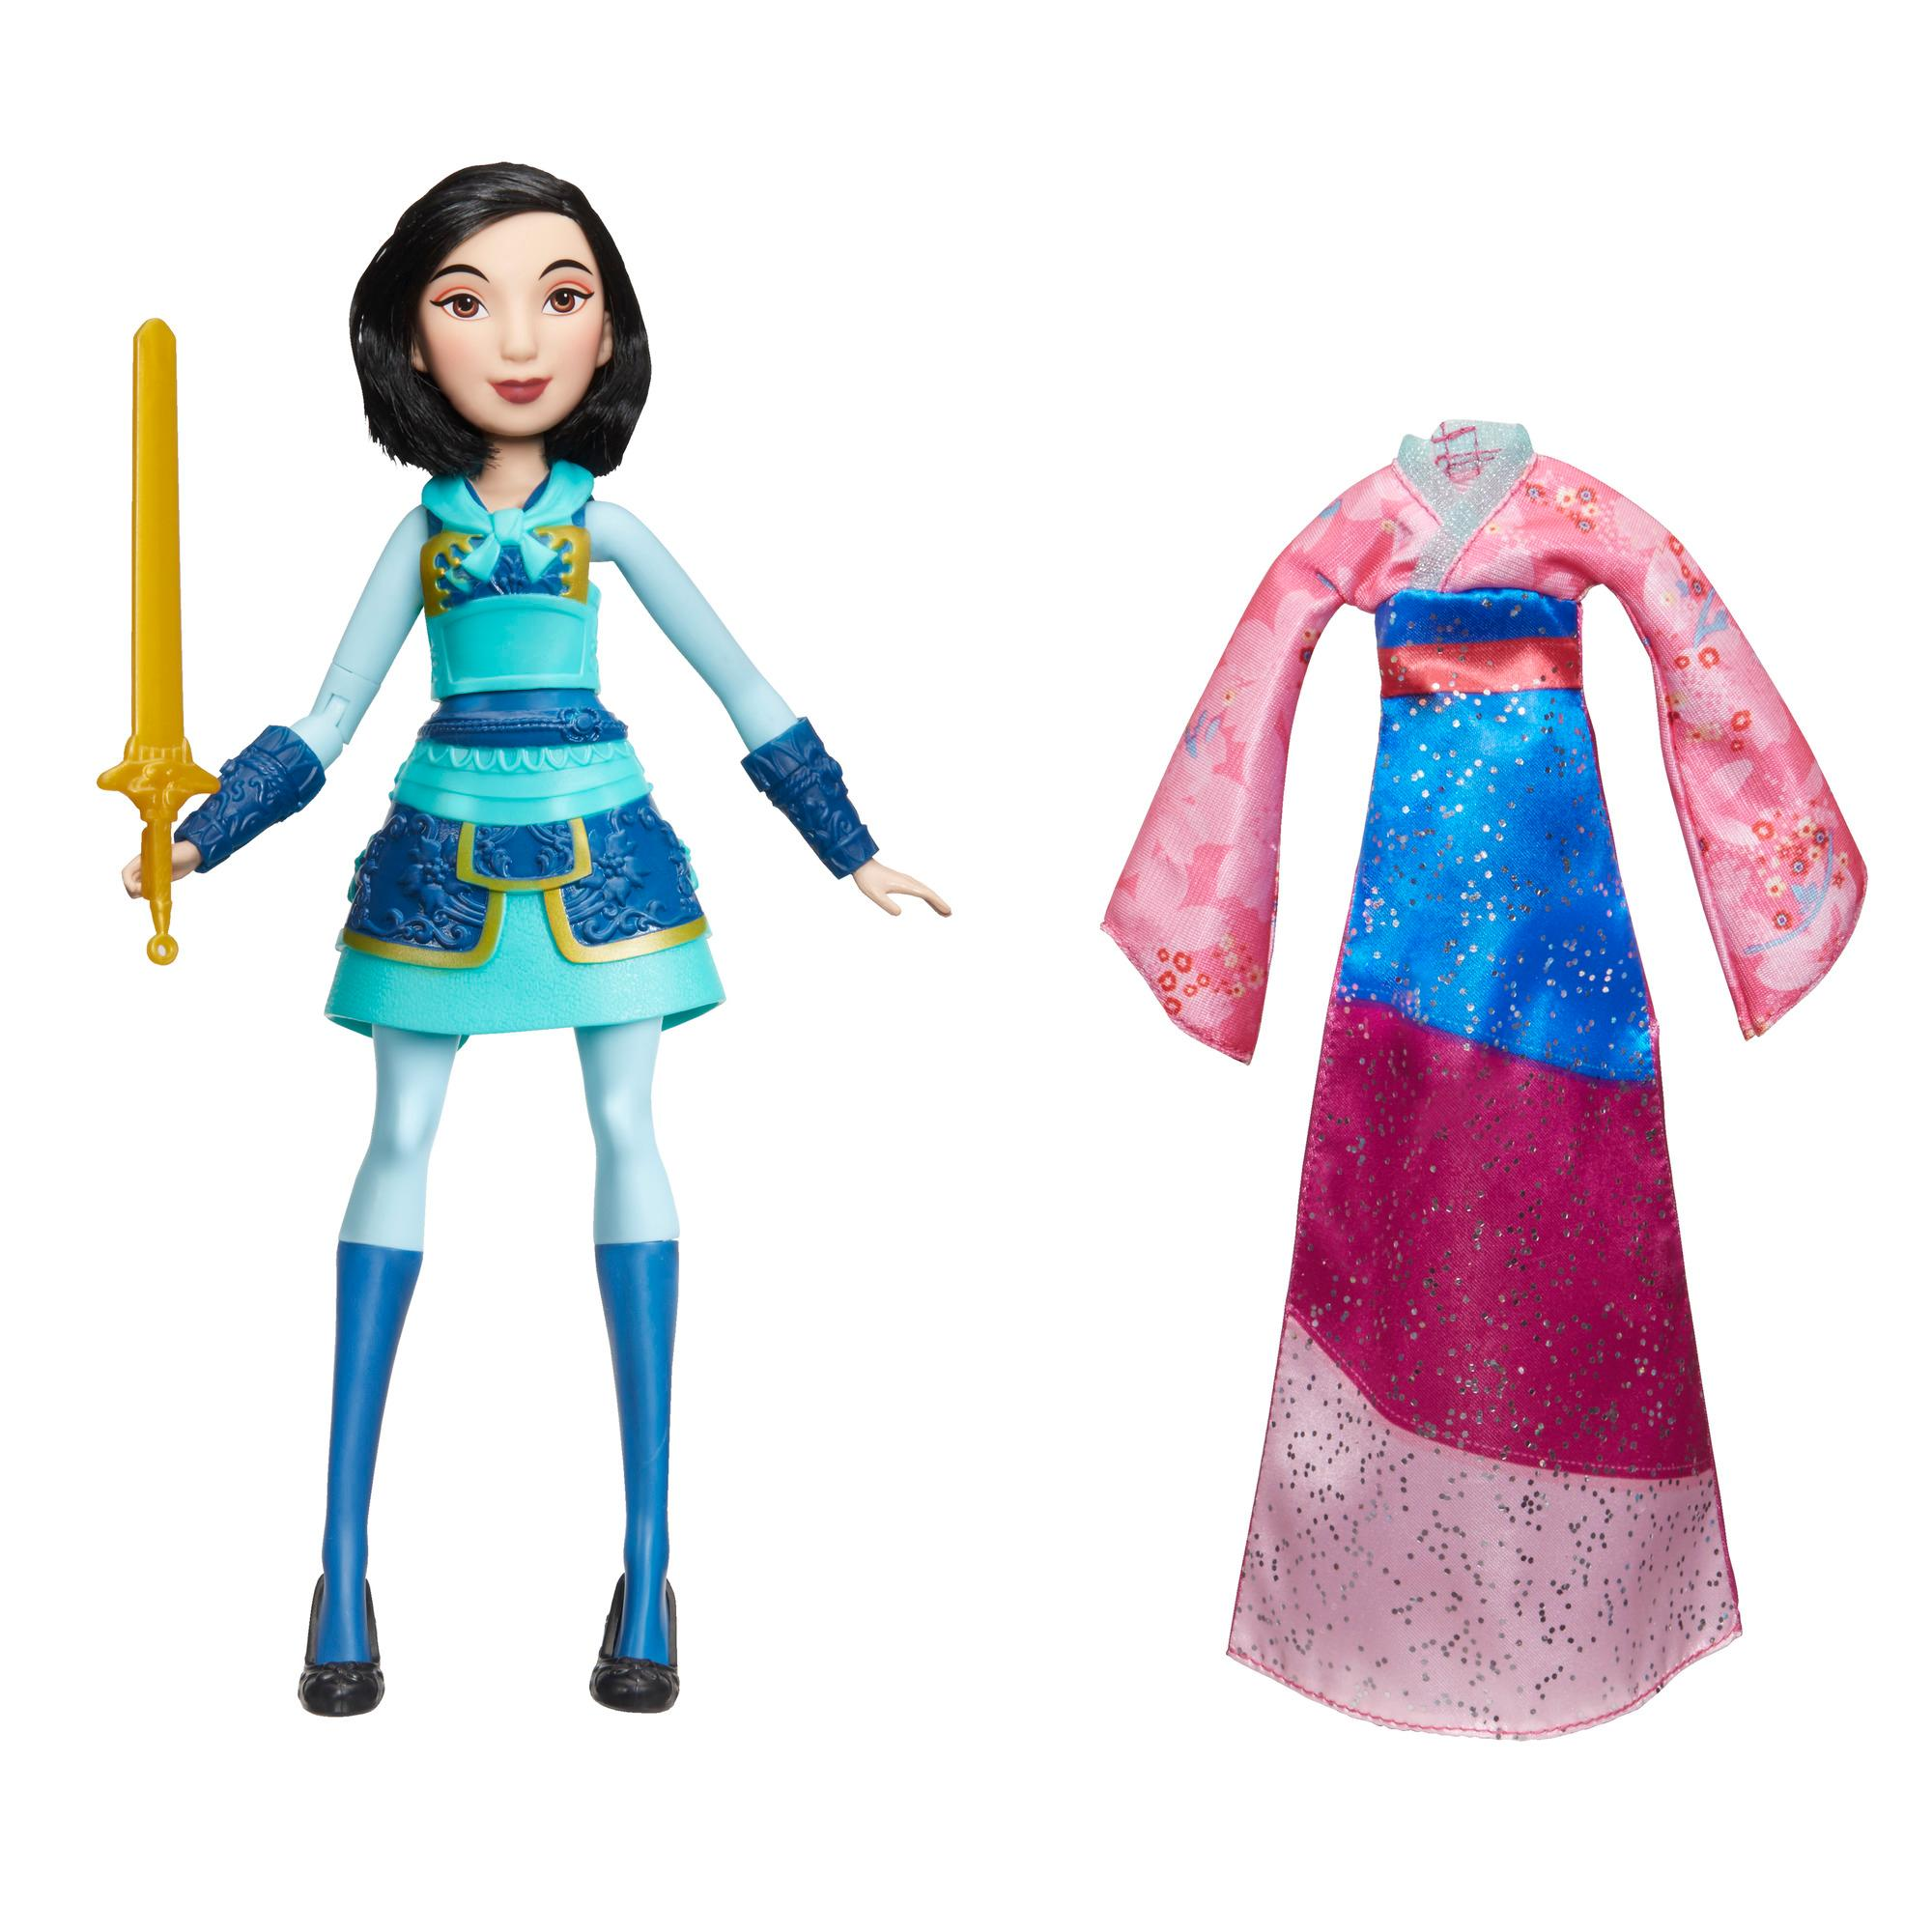 Disney Princess Mulán Audaces aventuras